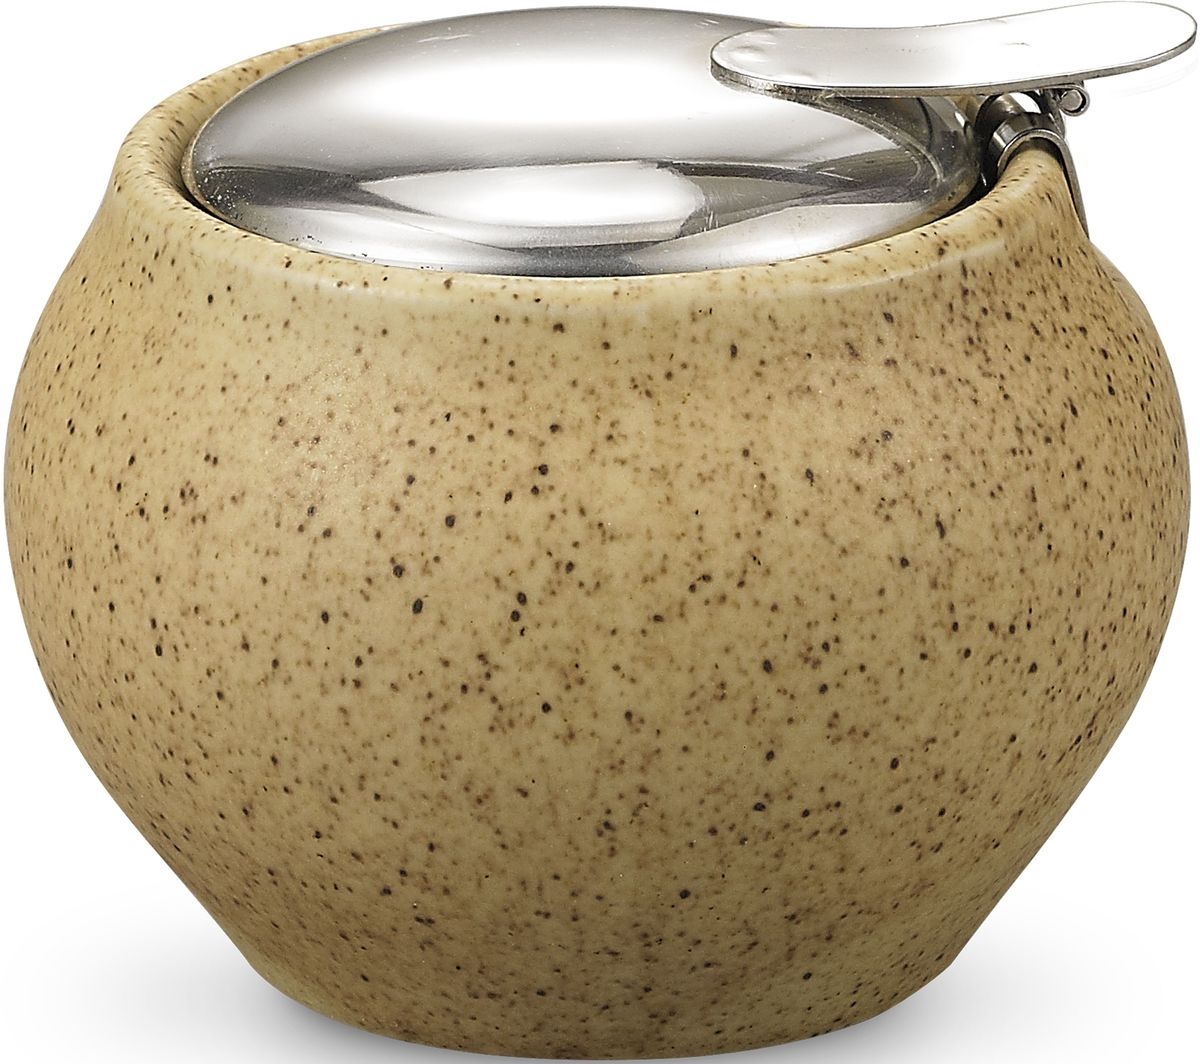 Сахарница Fissman, цвет: песочный, 250 мл. 9300 цена